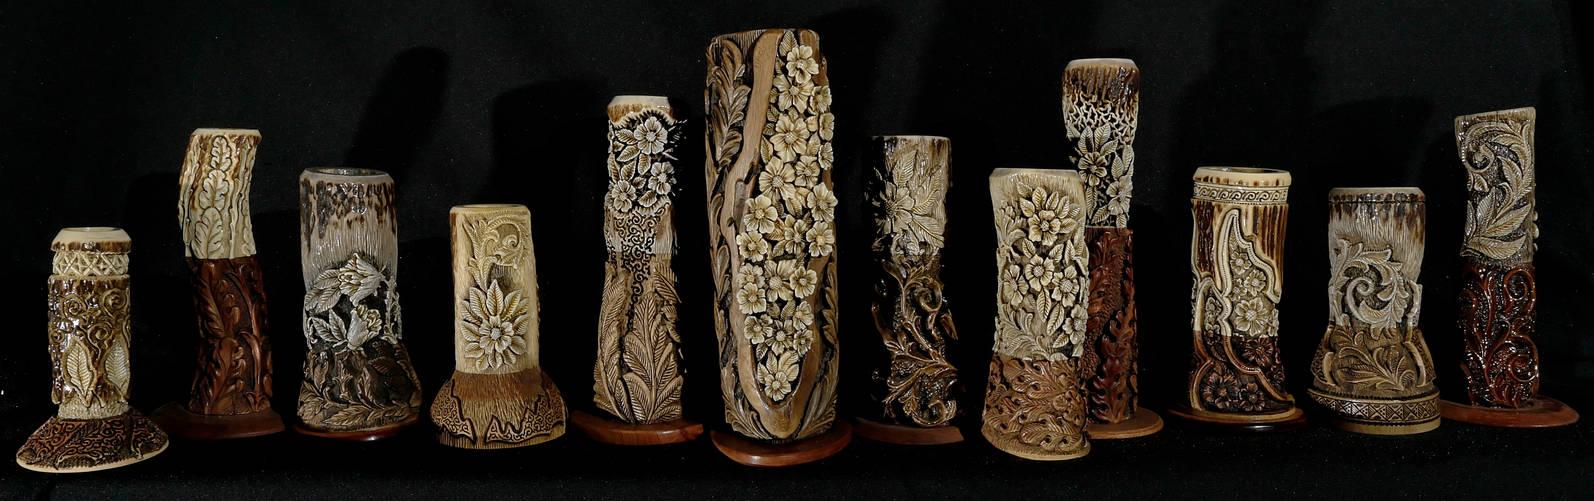 miniature vases for wild flowers